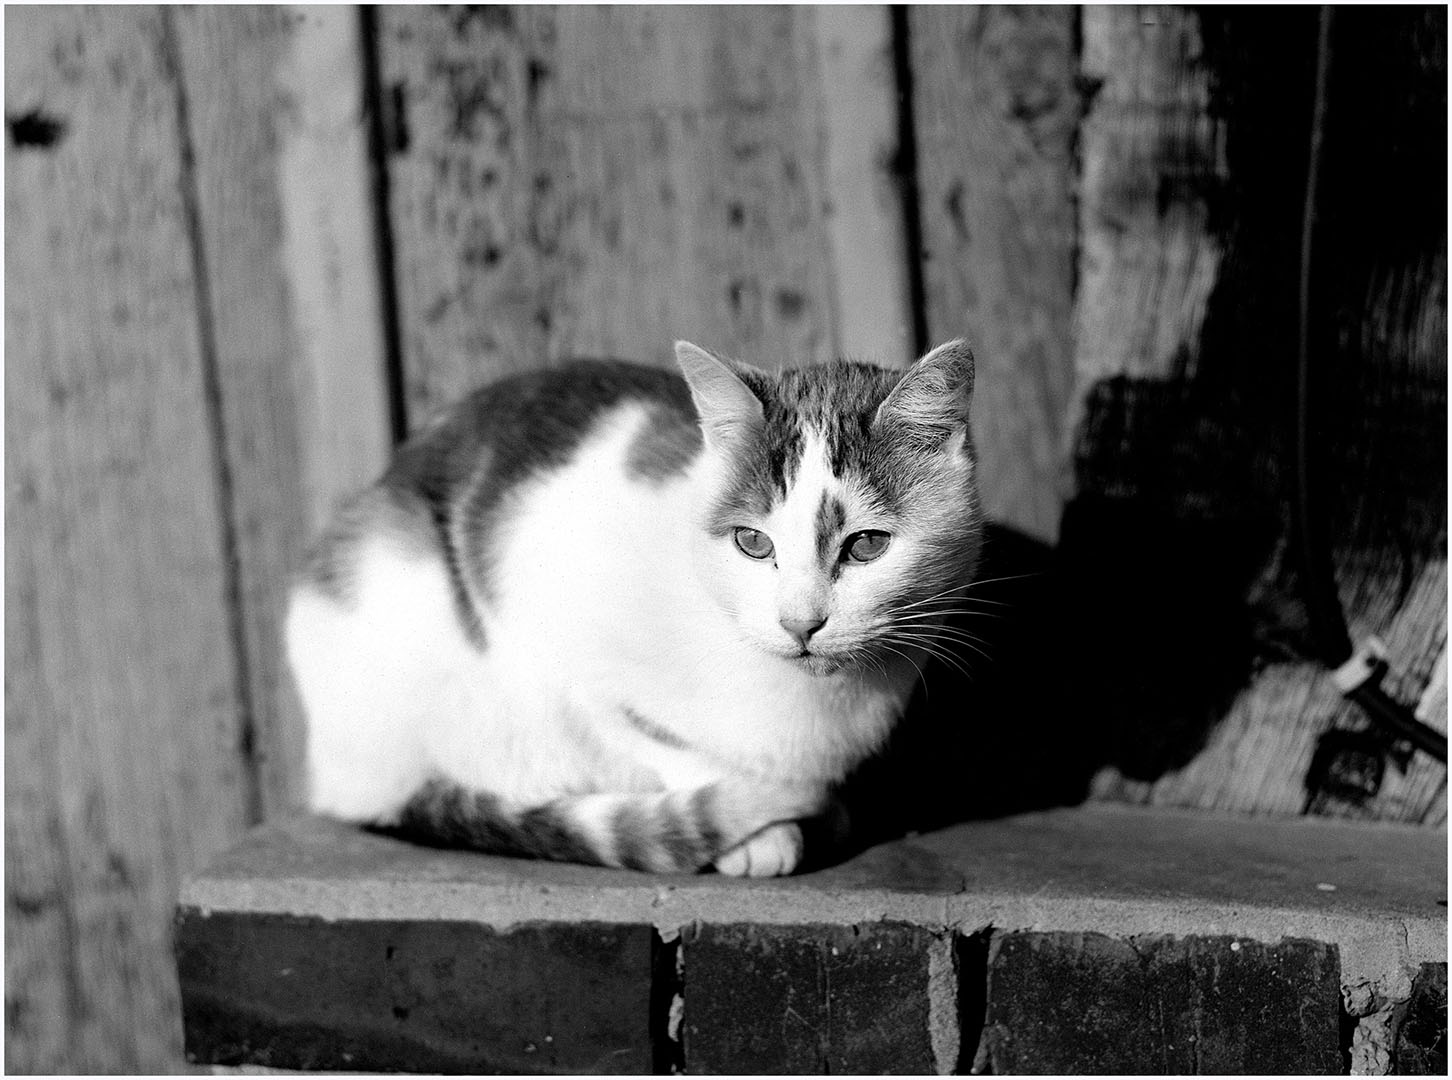 Lazy_Cats_035_K1.23